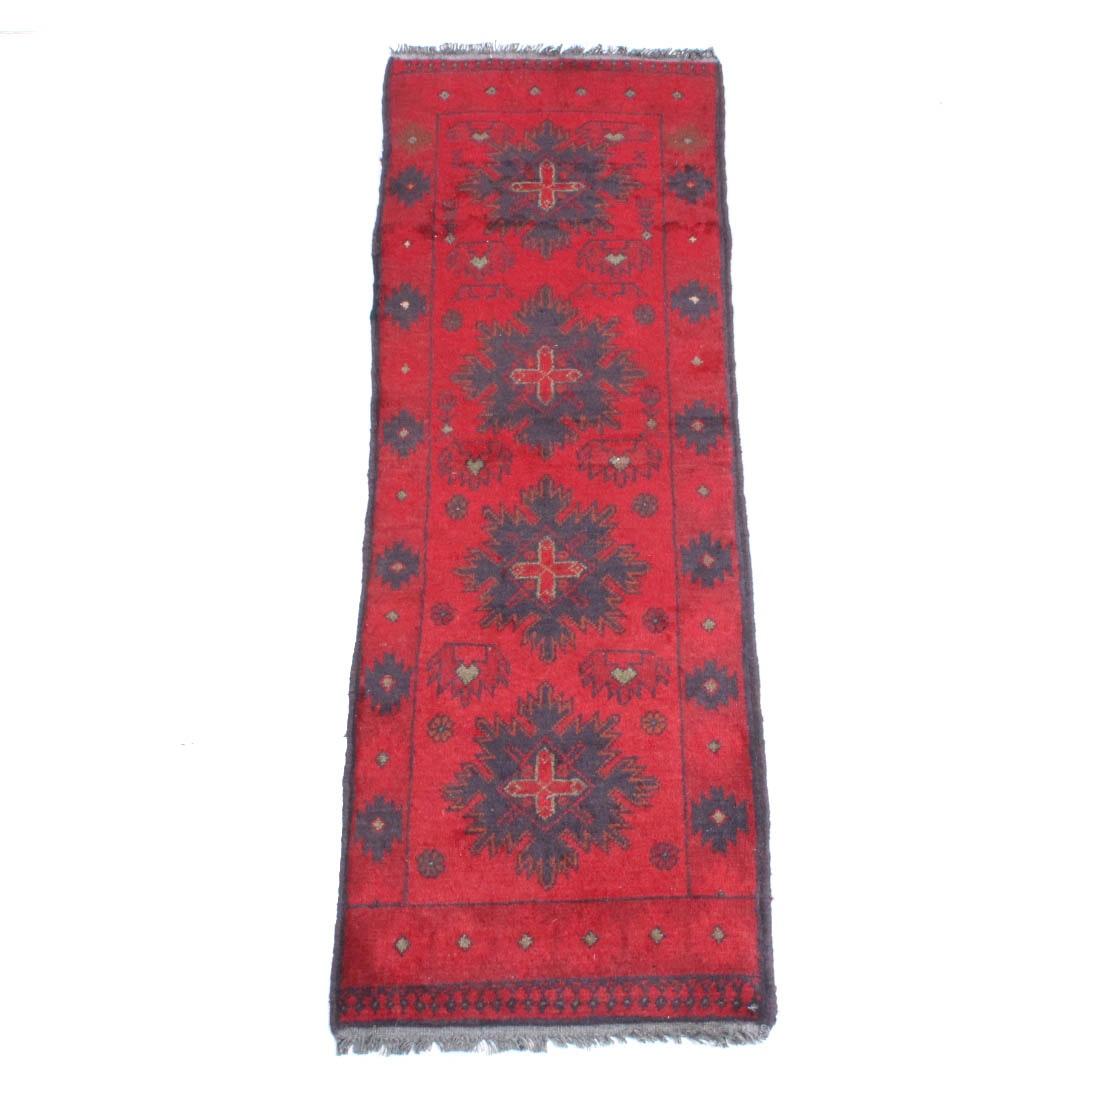 Hand Knotted Afghani Turkmen Carpet Runner